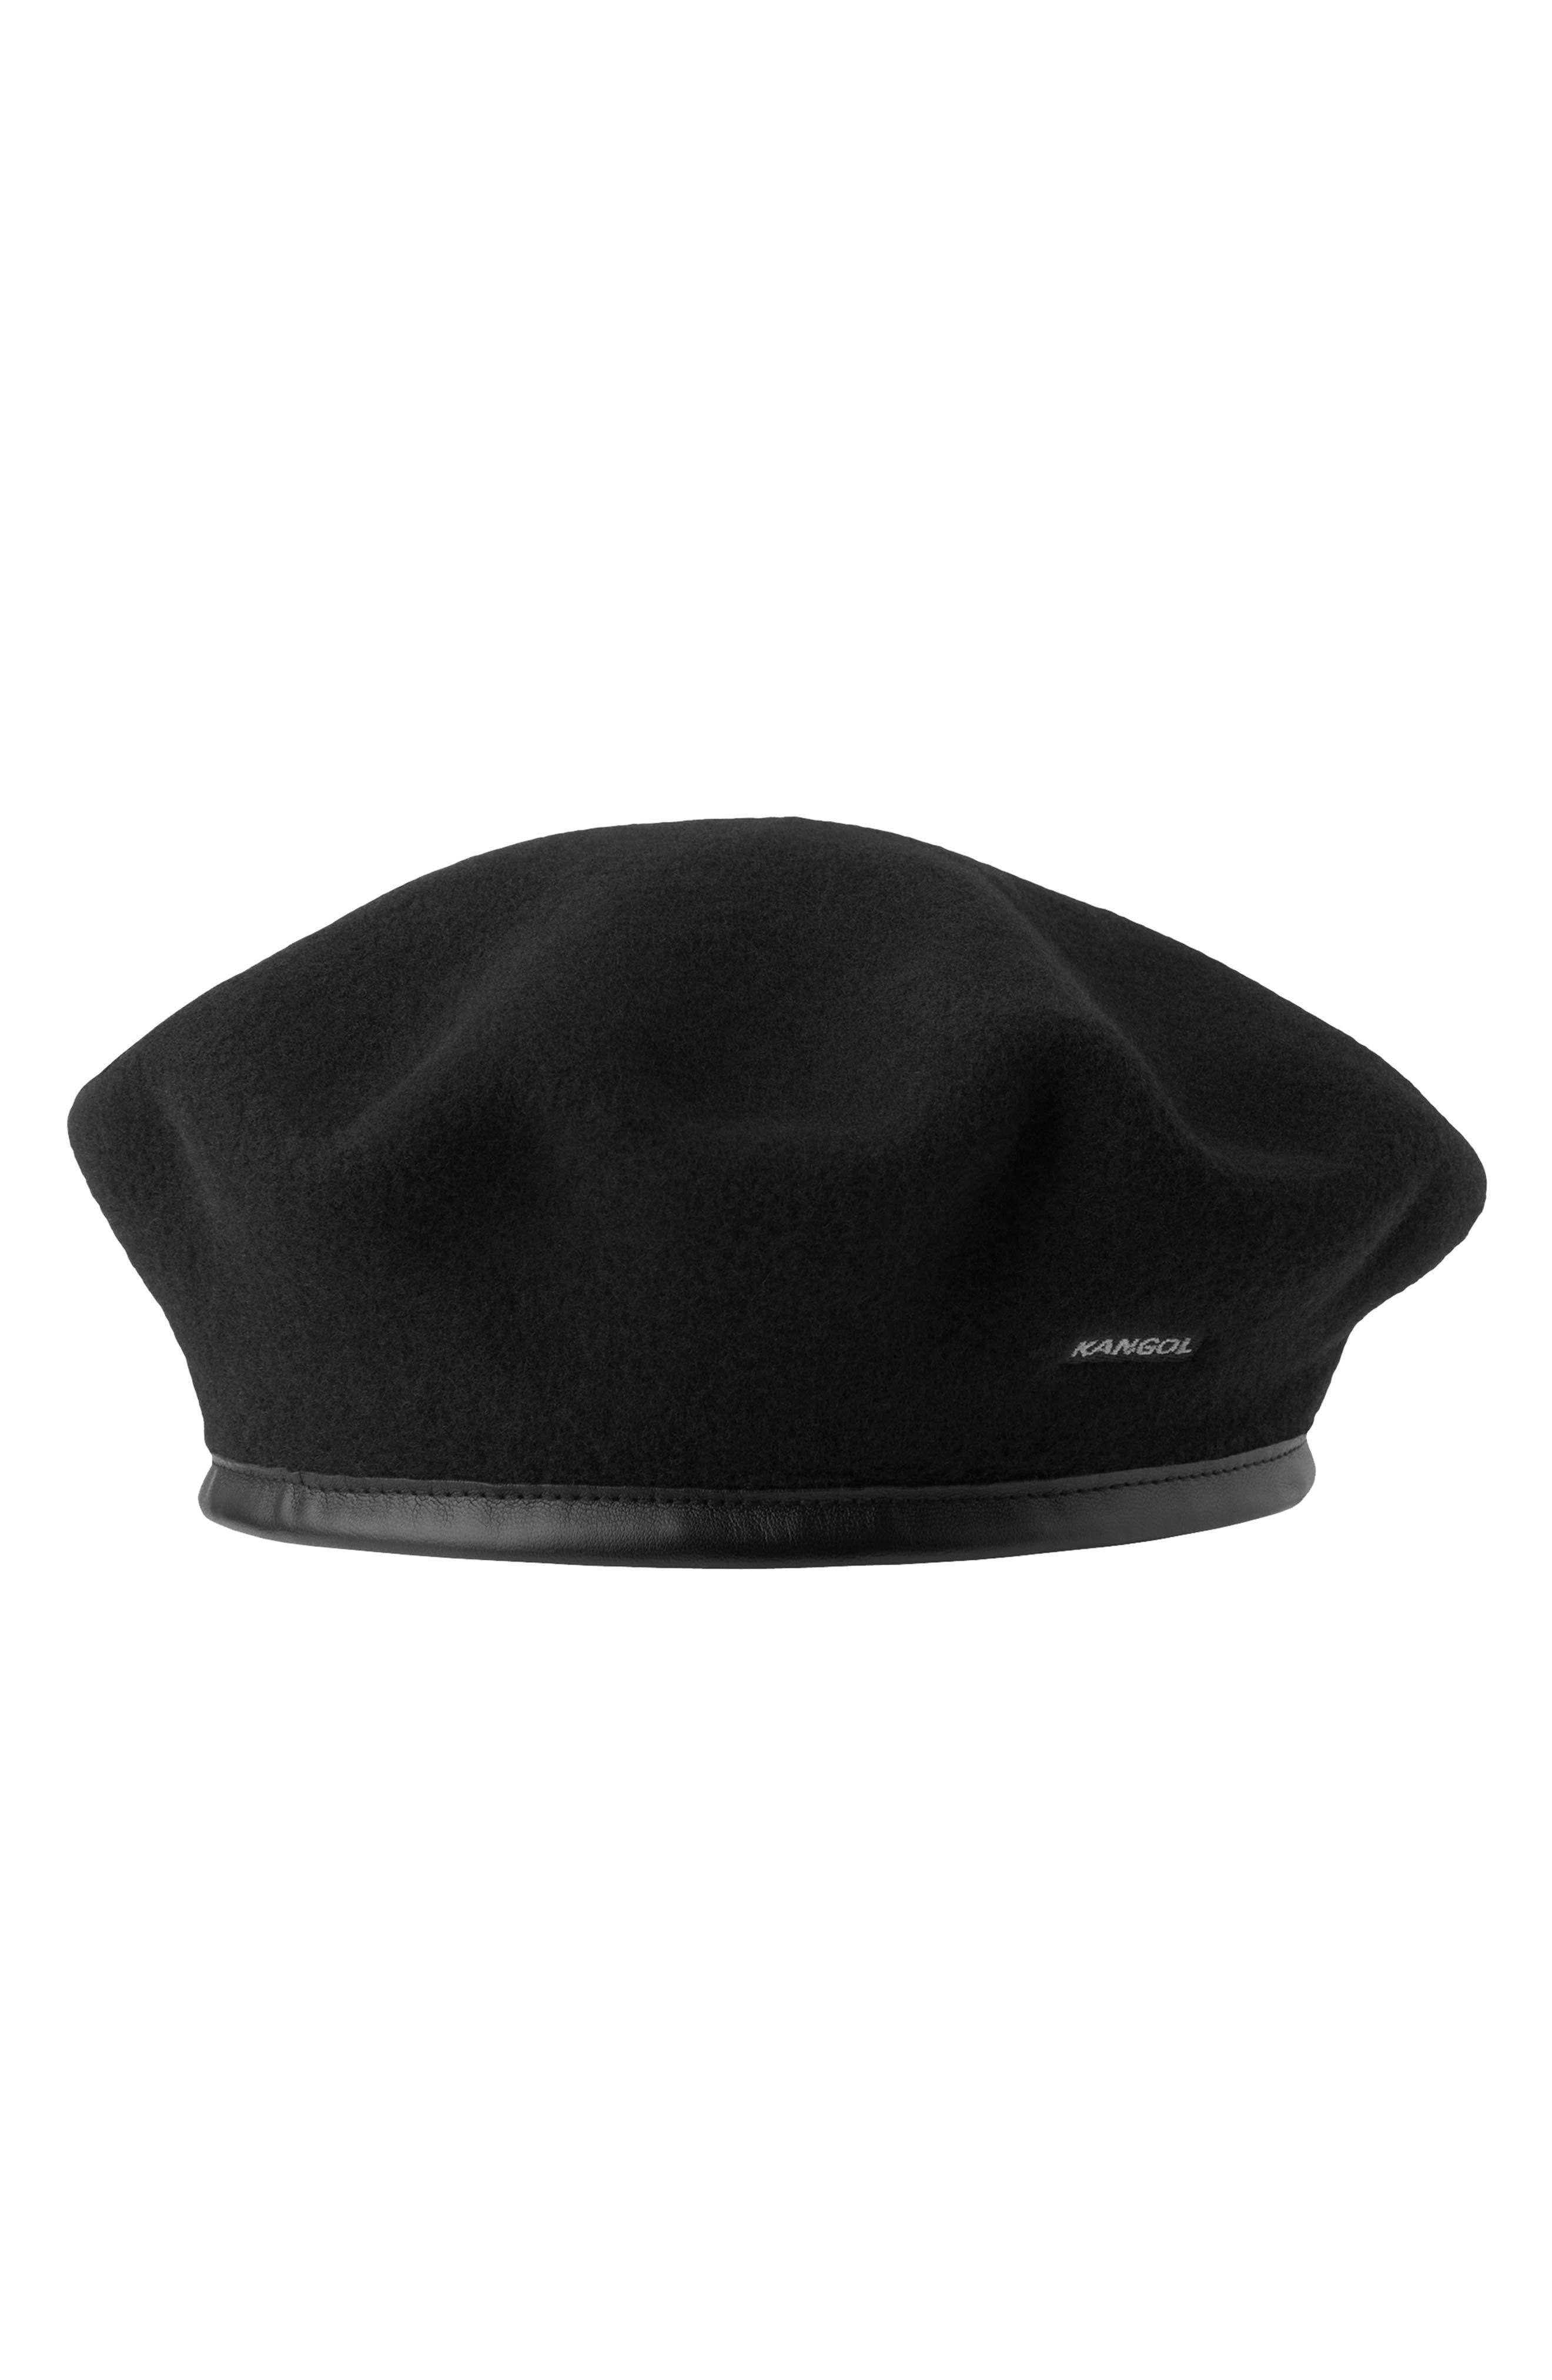 KANGOL Monty Wool Beret - Black